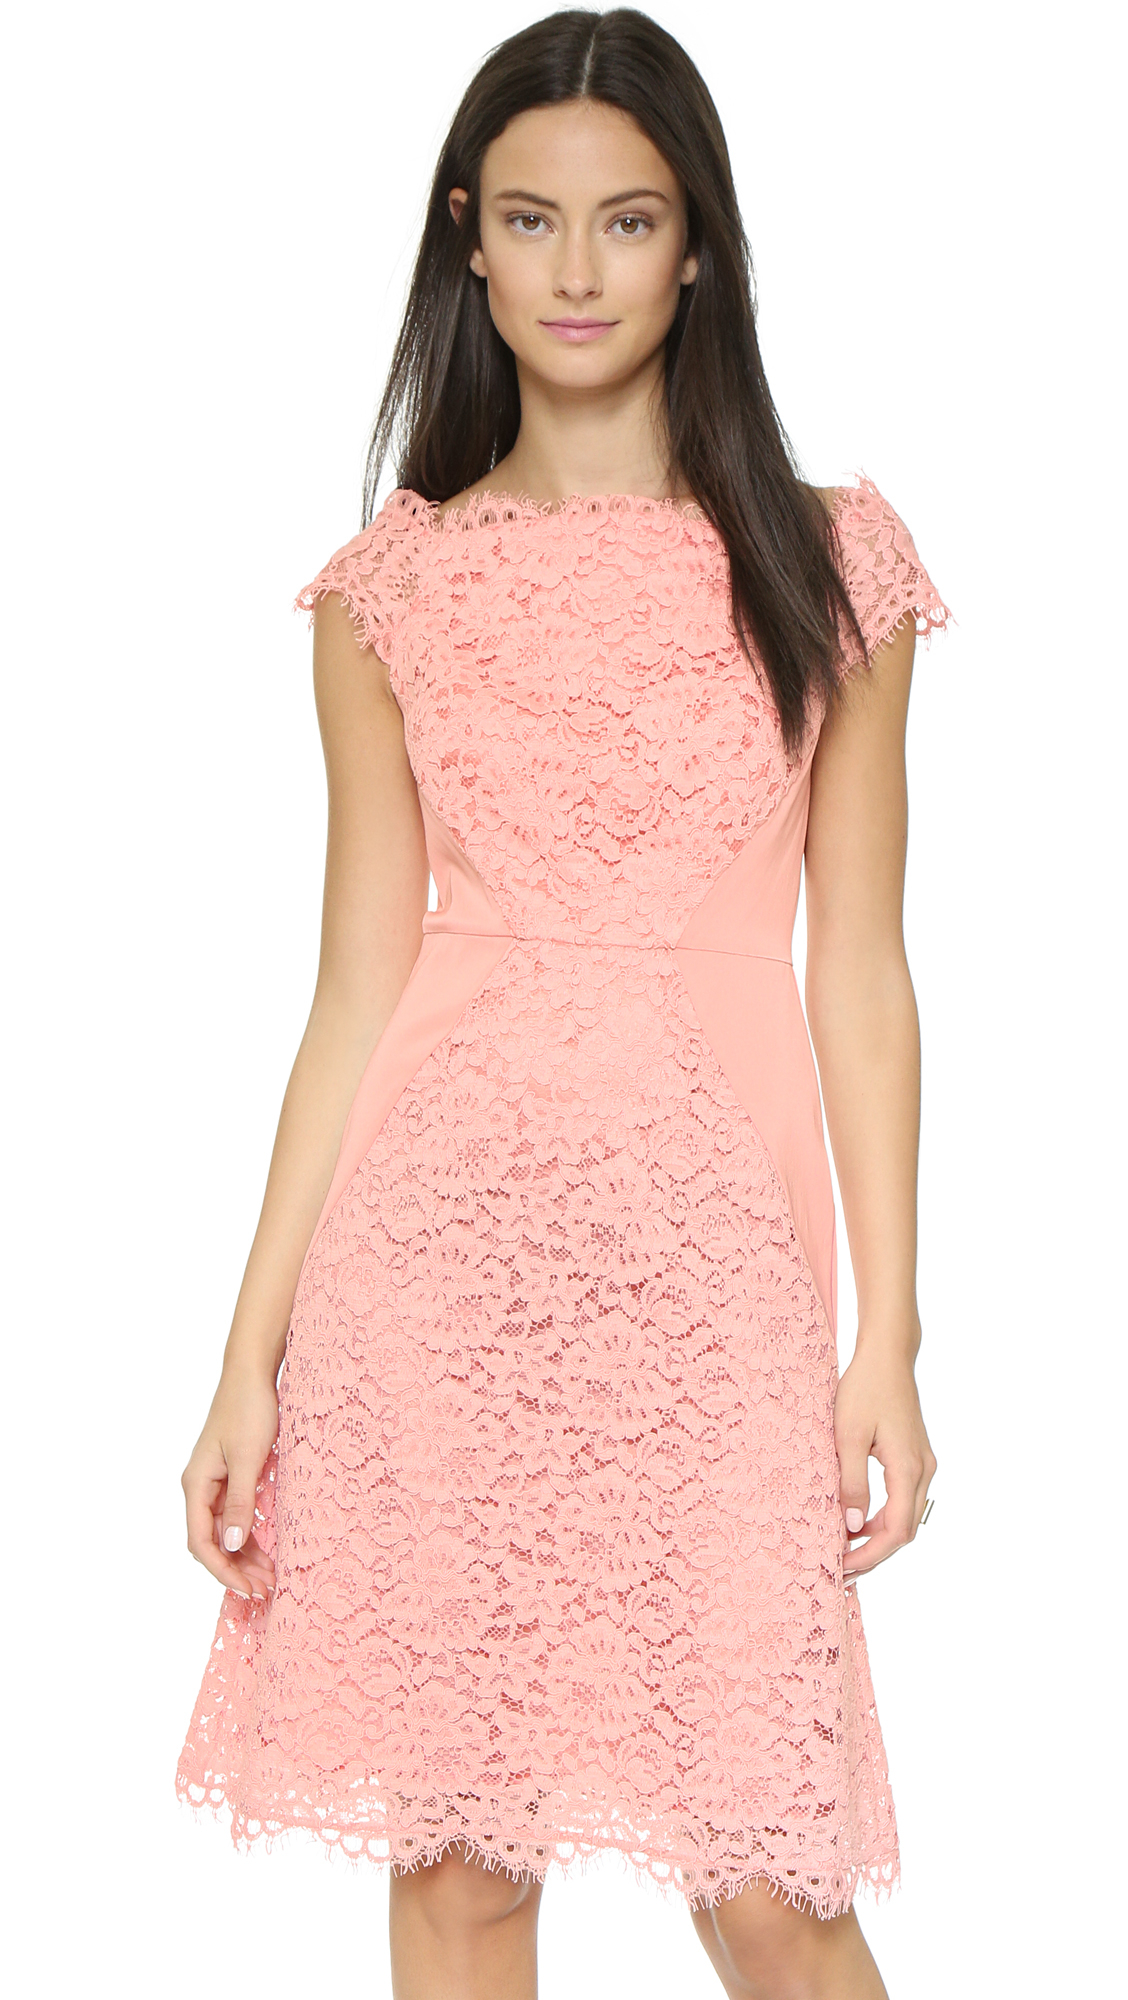 Shoshanna Marcela Dress - Peach in Pink   Lyst